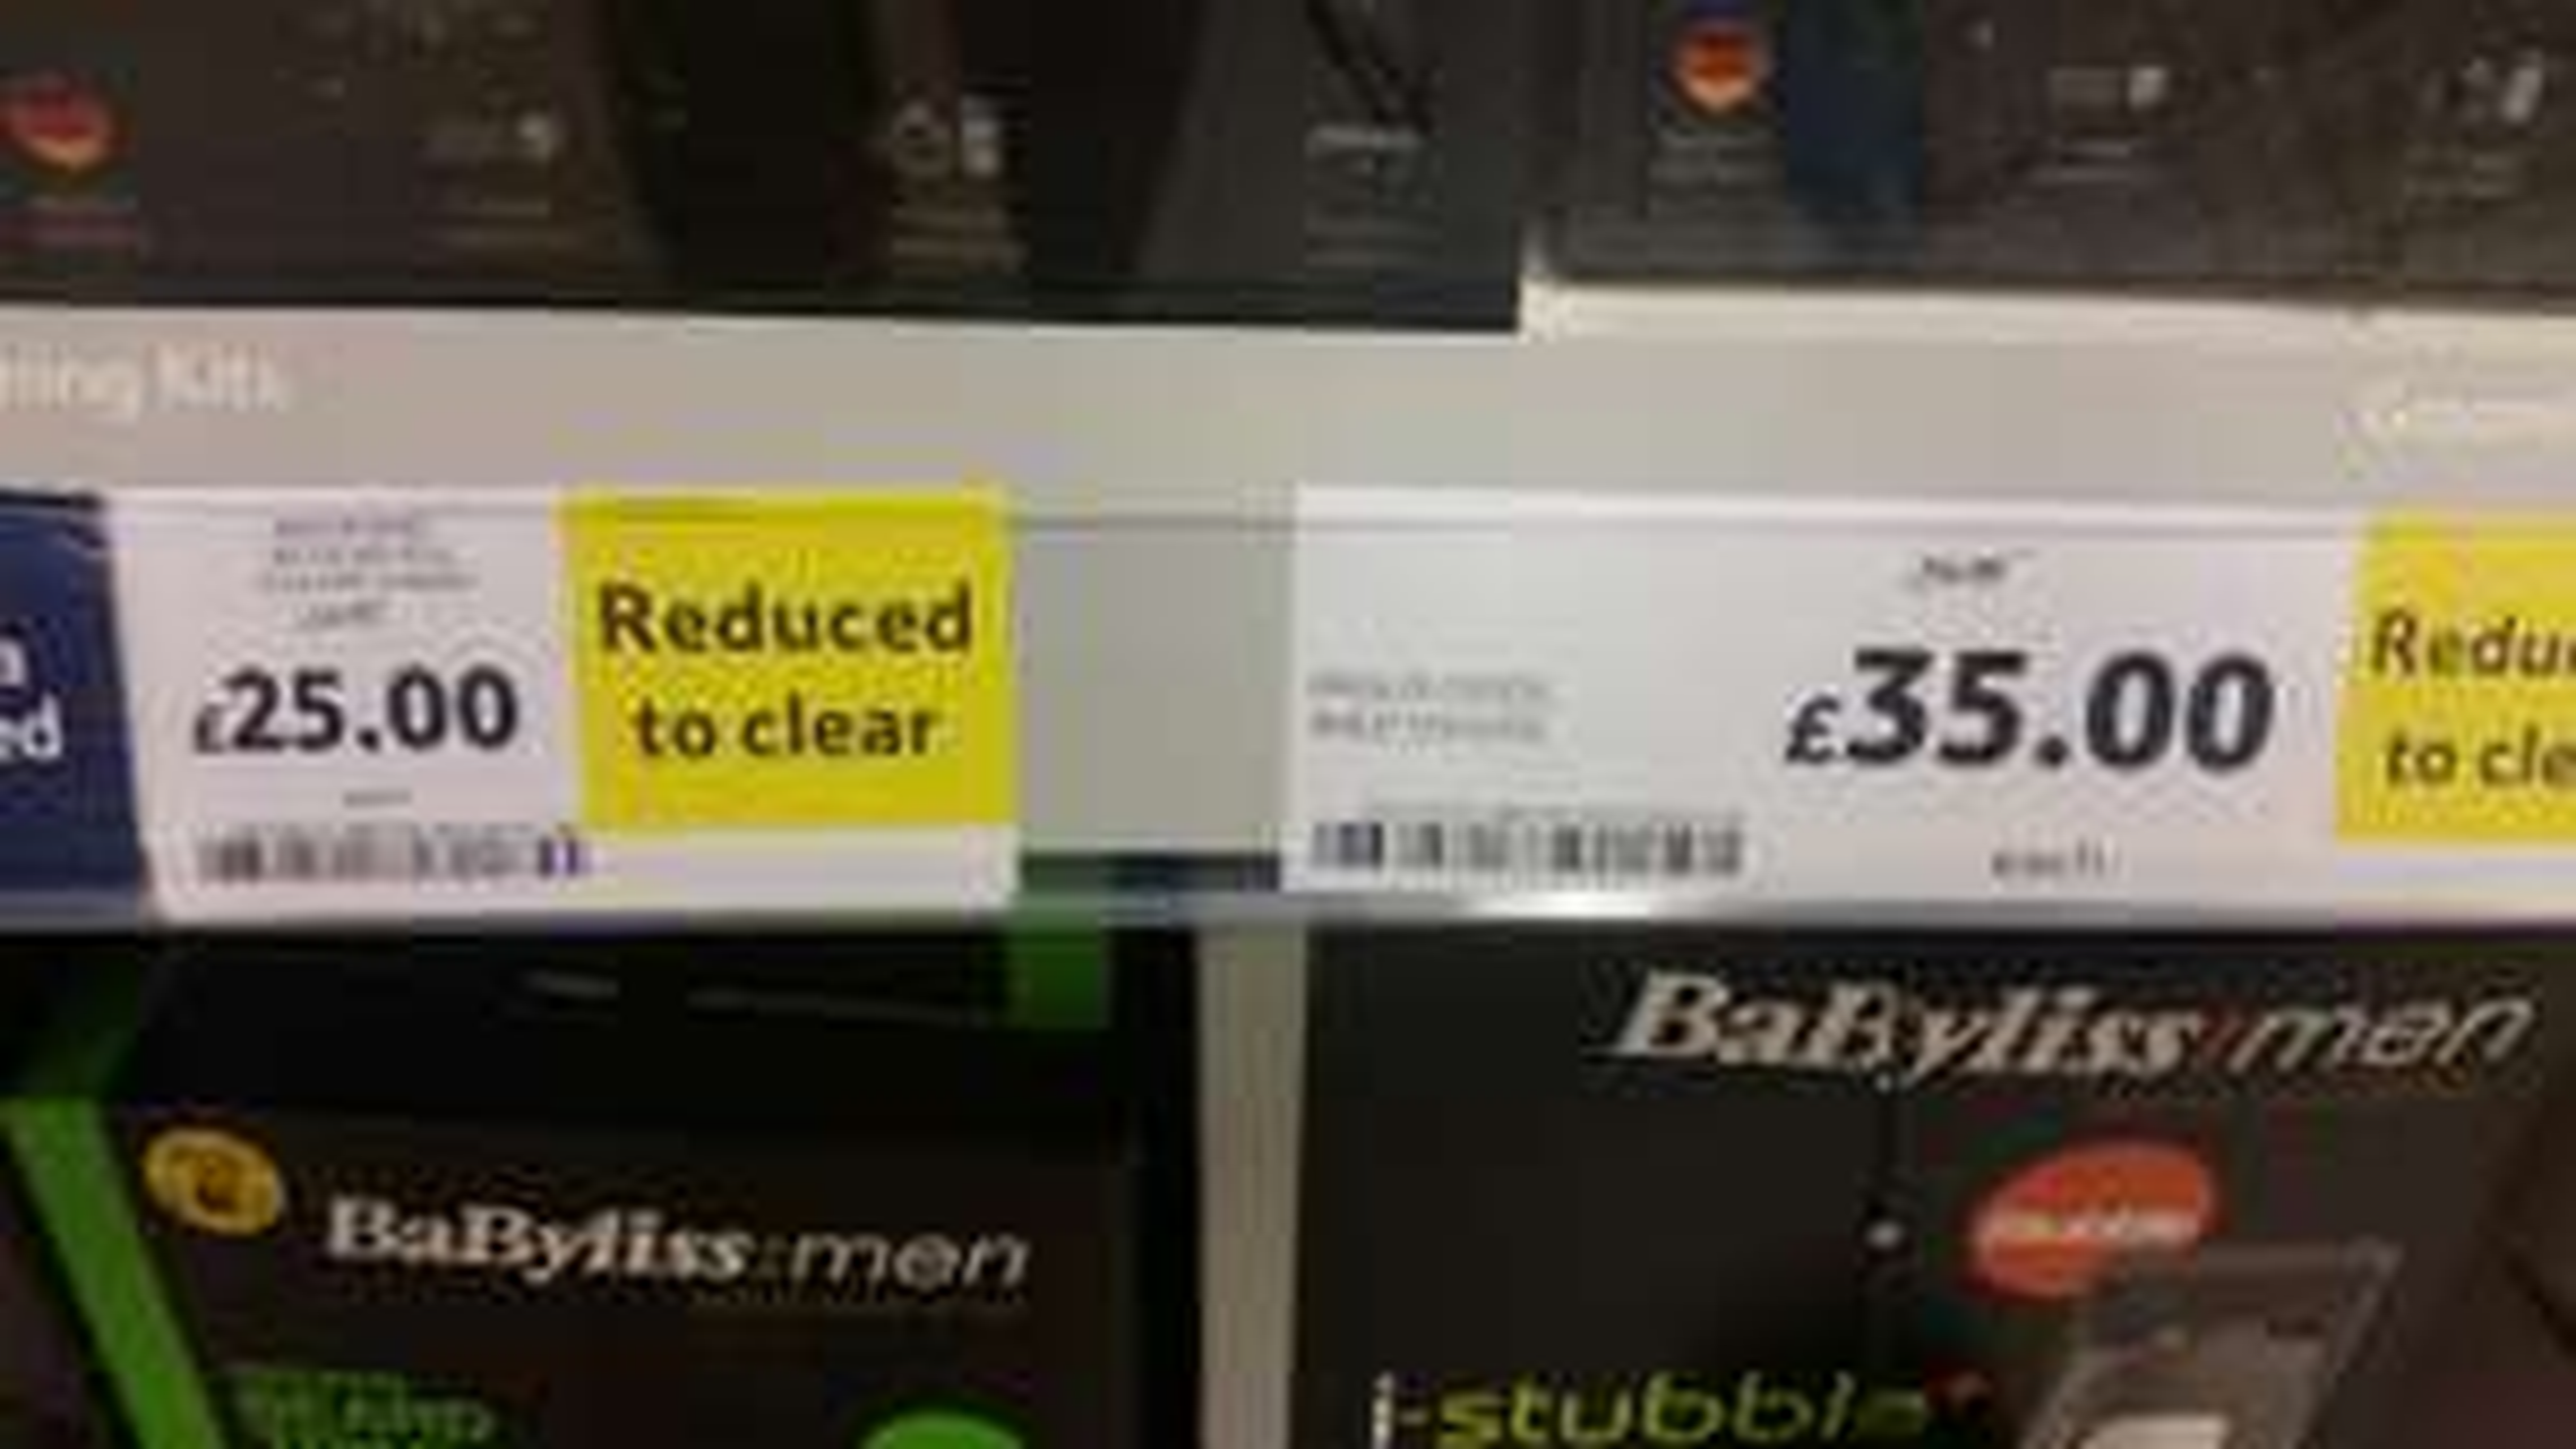 Braun 3080S Wet and Dry Shaver *INSTORE* Tesco instore (Bangor) - £35